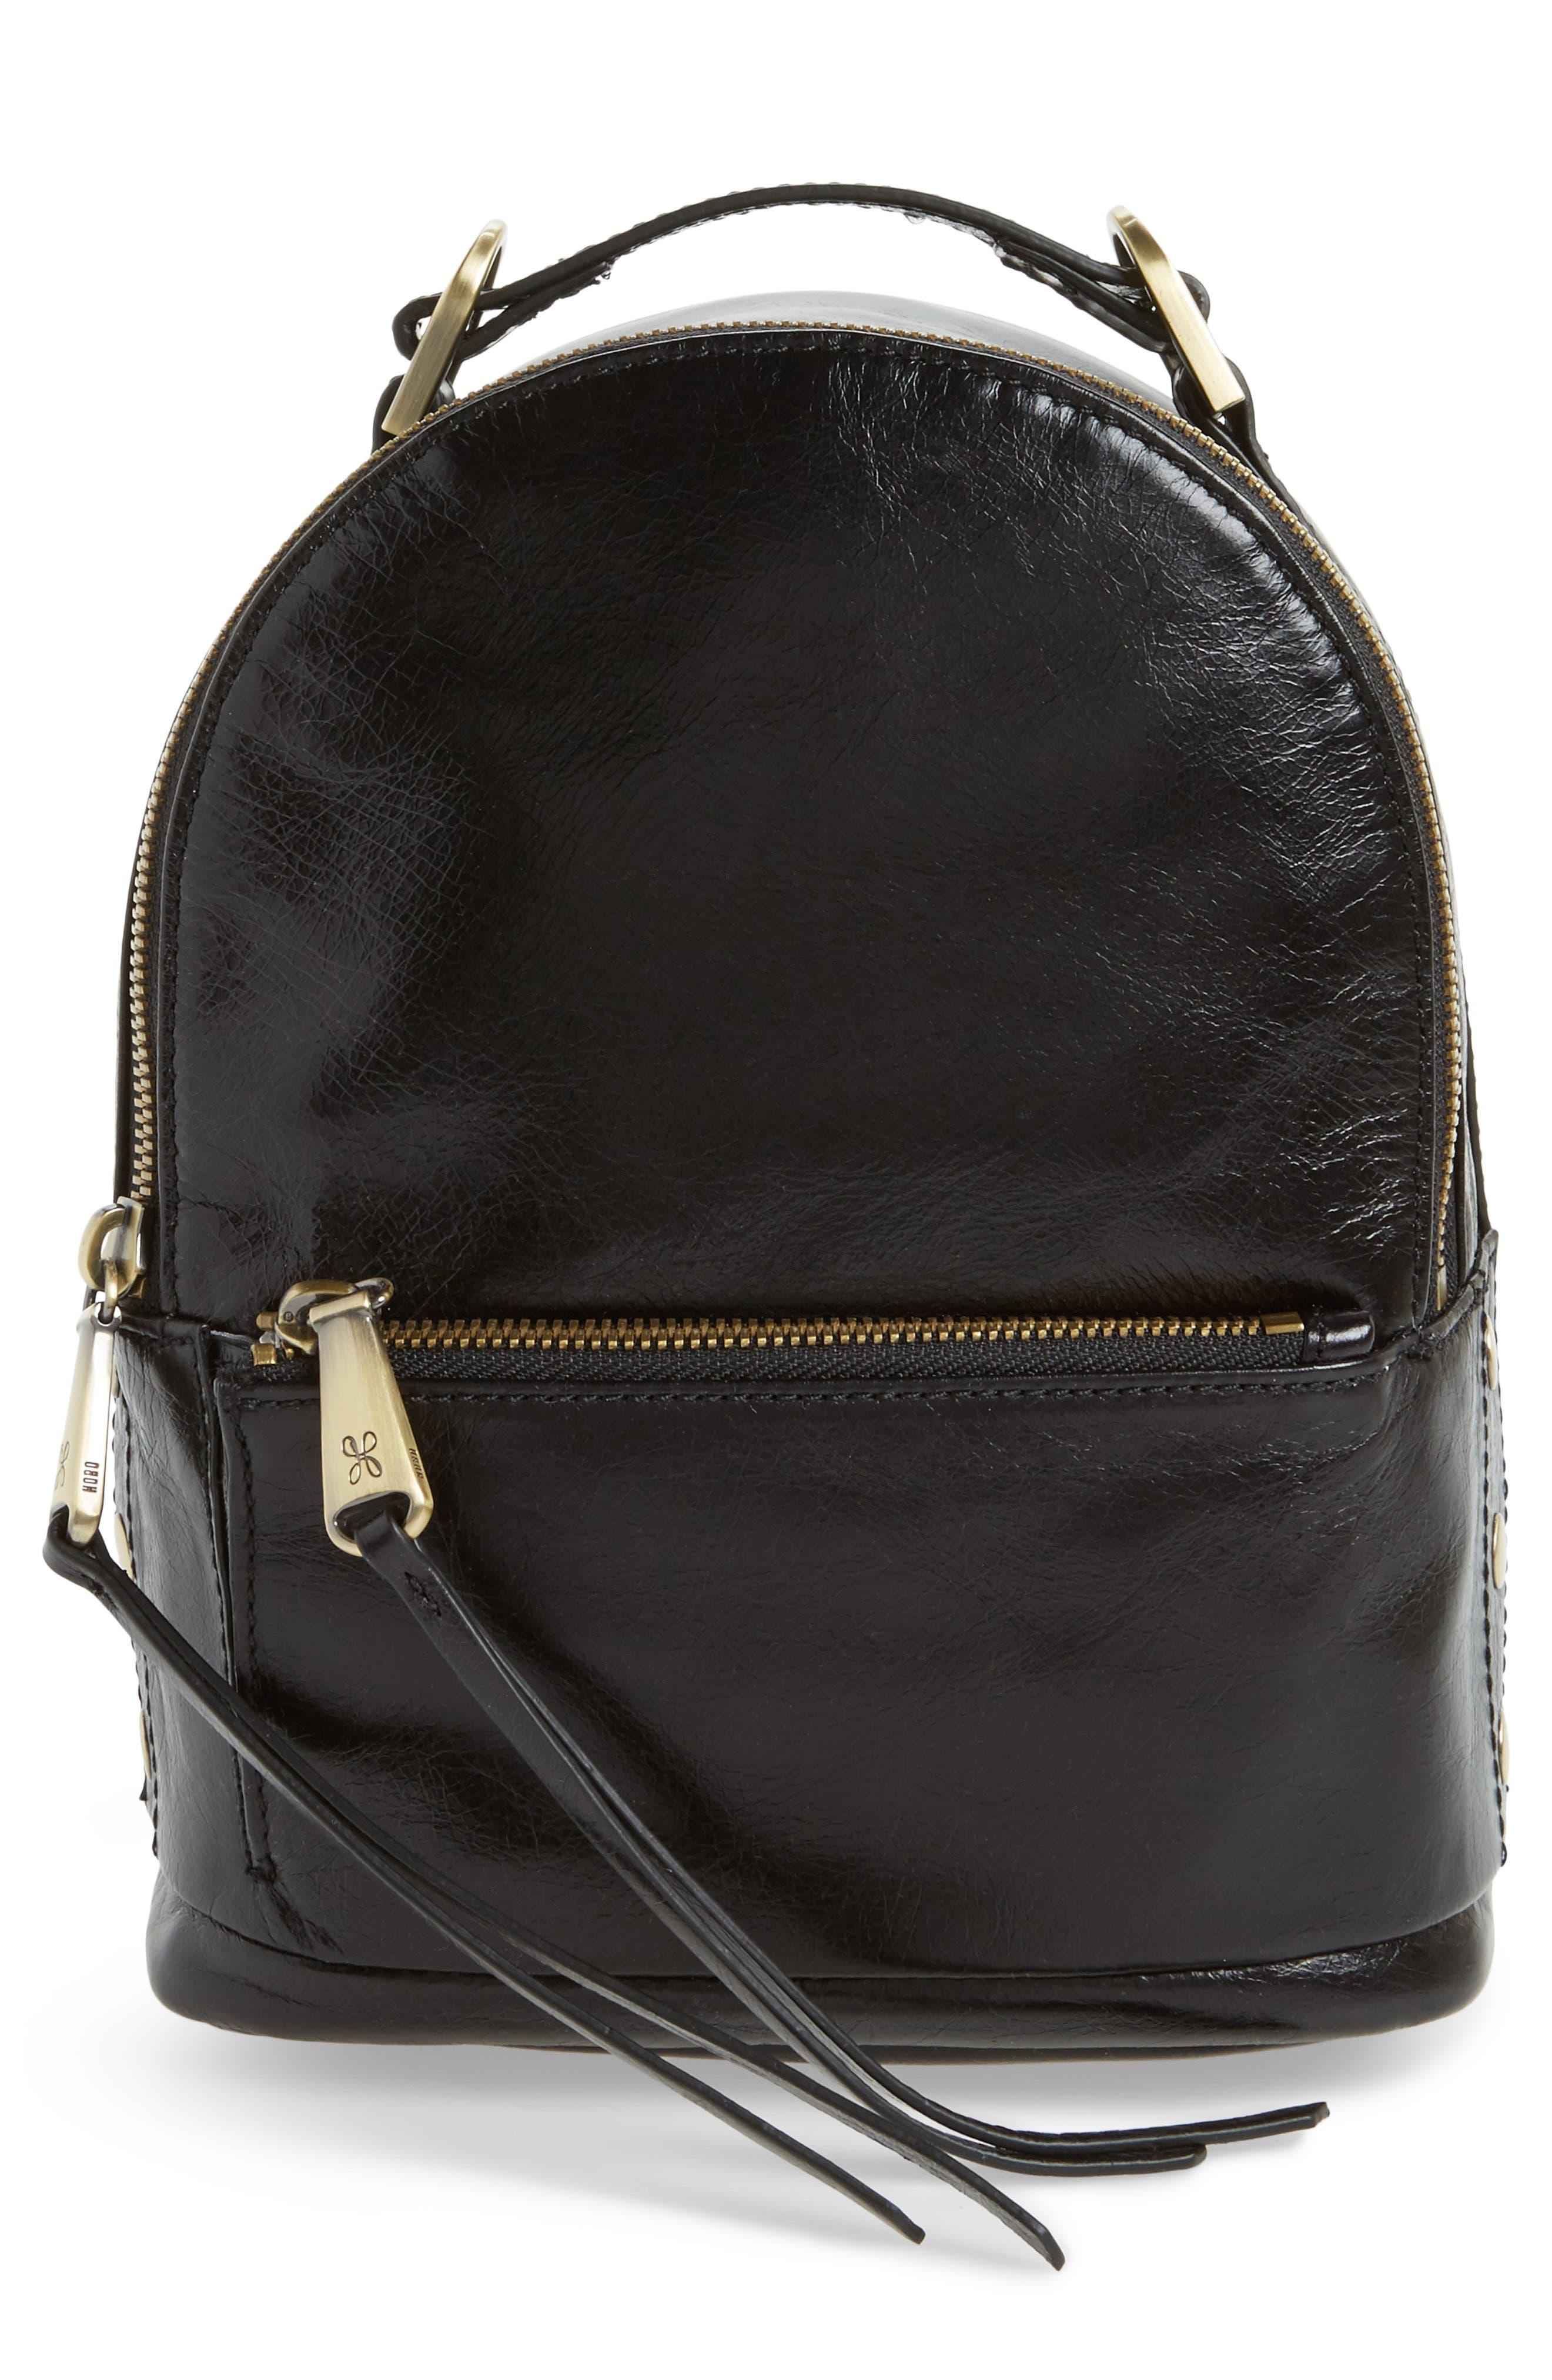 Hobo Revel Convertible Leather Backpack